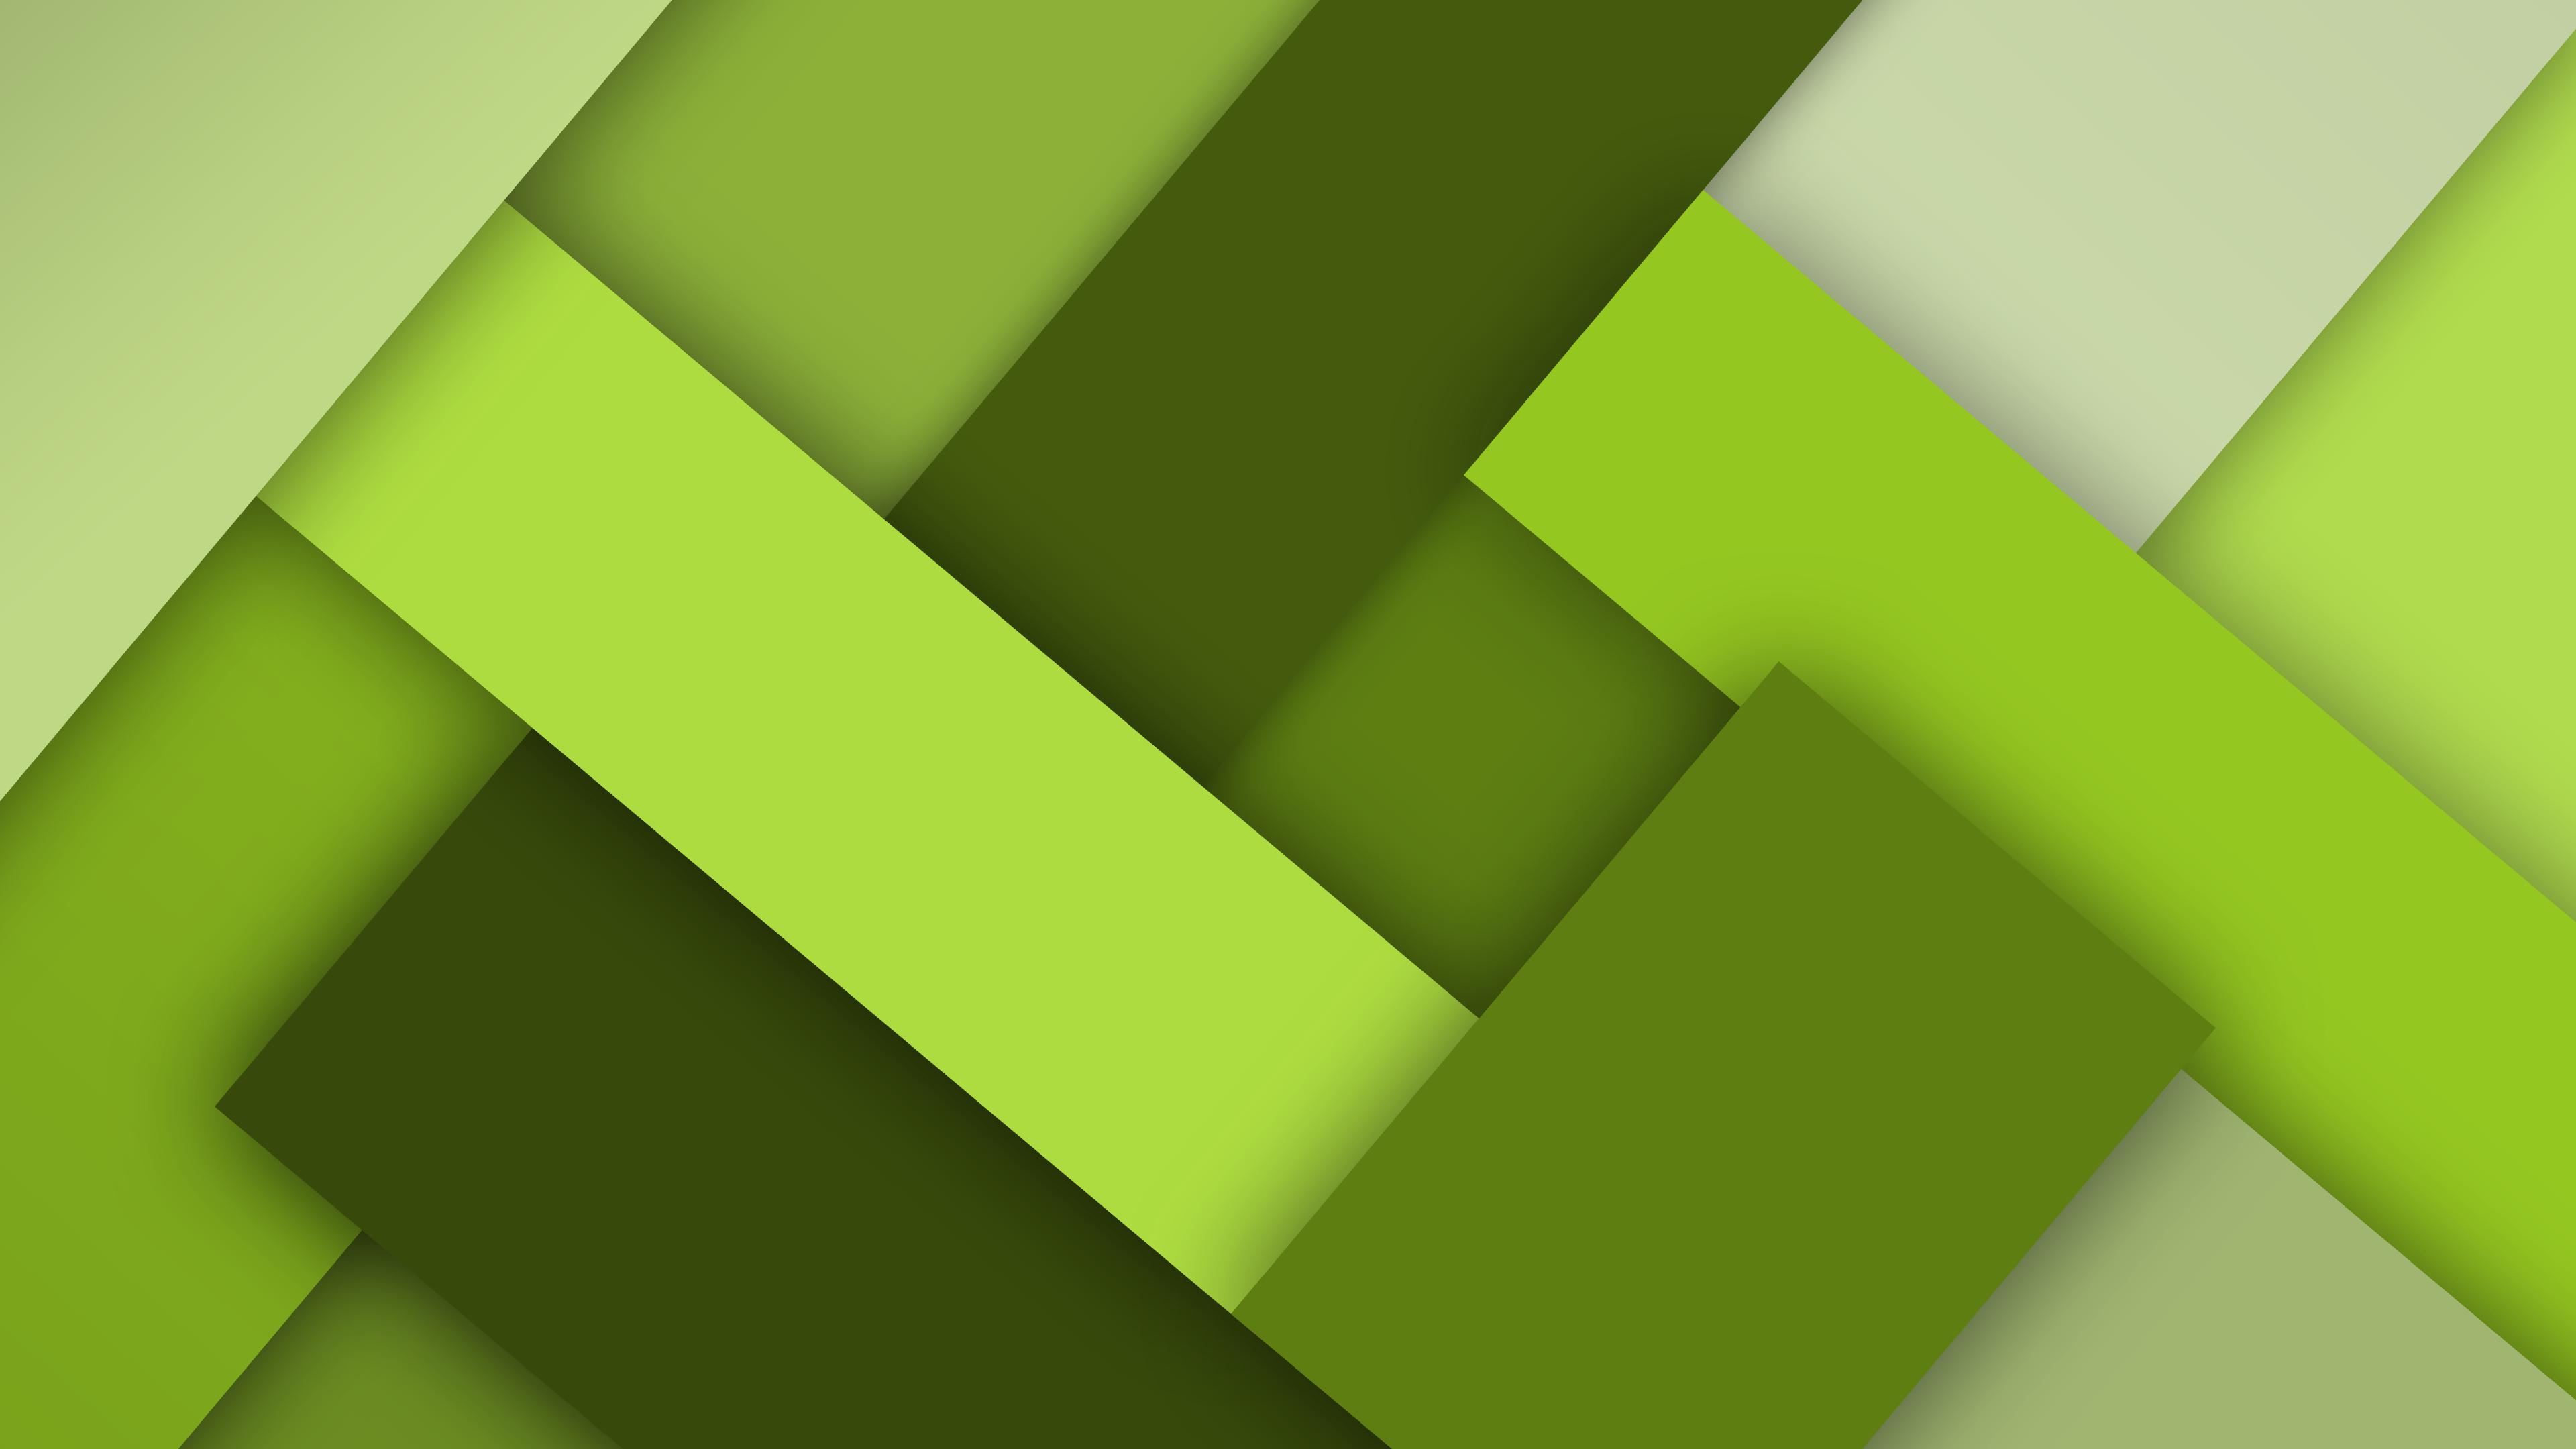 Illustration Digital Art Minimalism Grass Green Yellow Simple Triangle Pattern Texture Circle Color Leaf Shape Design